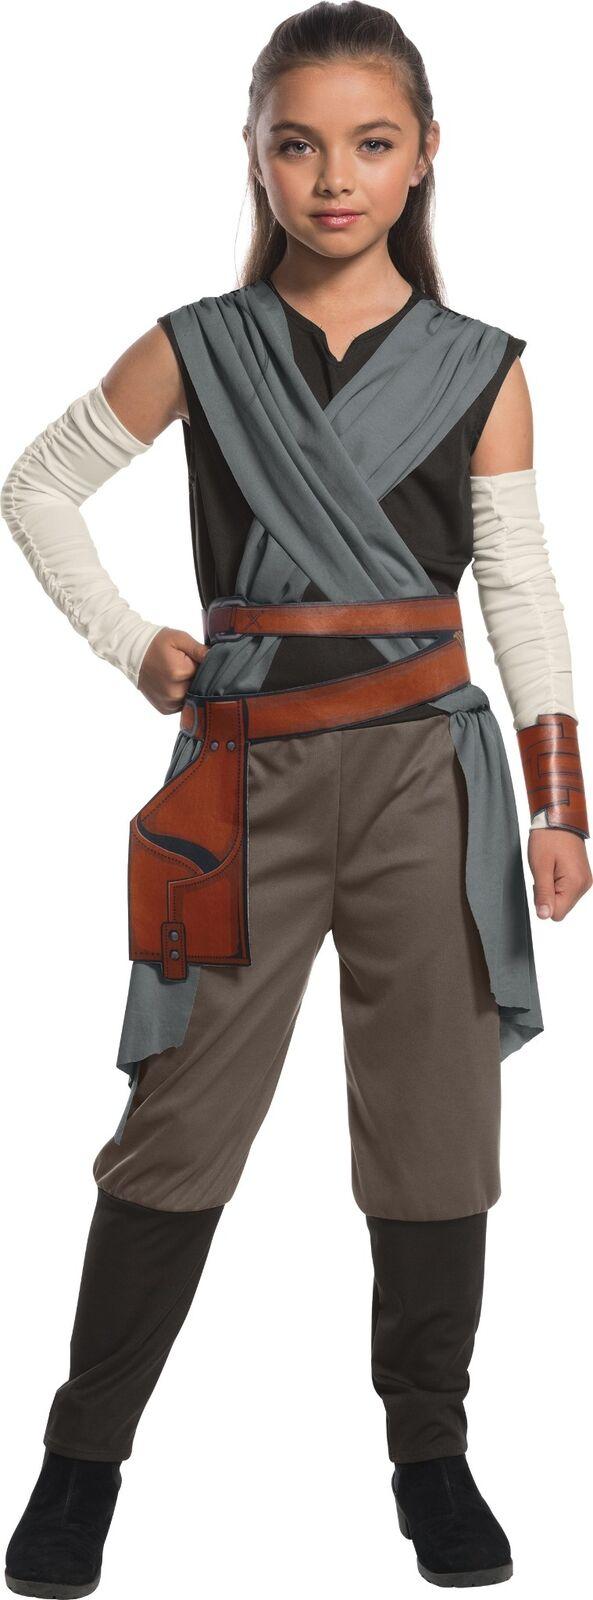 Star Wars The Last Jedi - Rey Child Girls New Costume